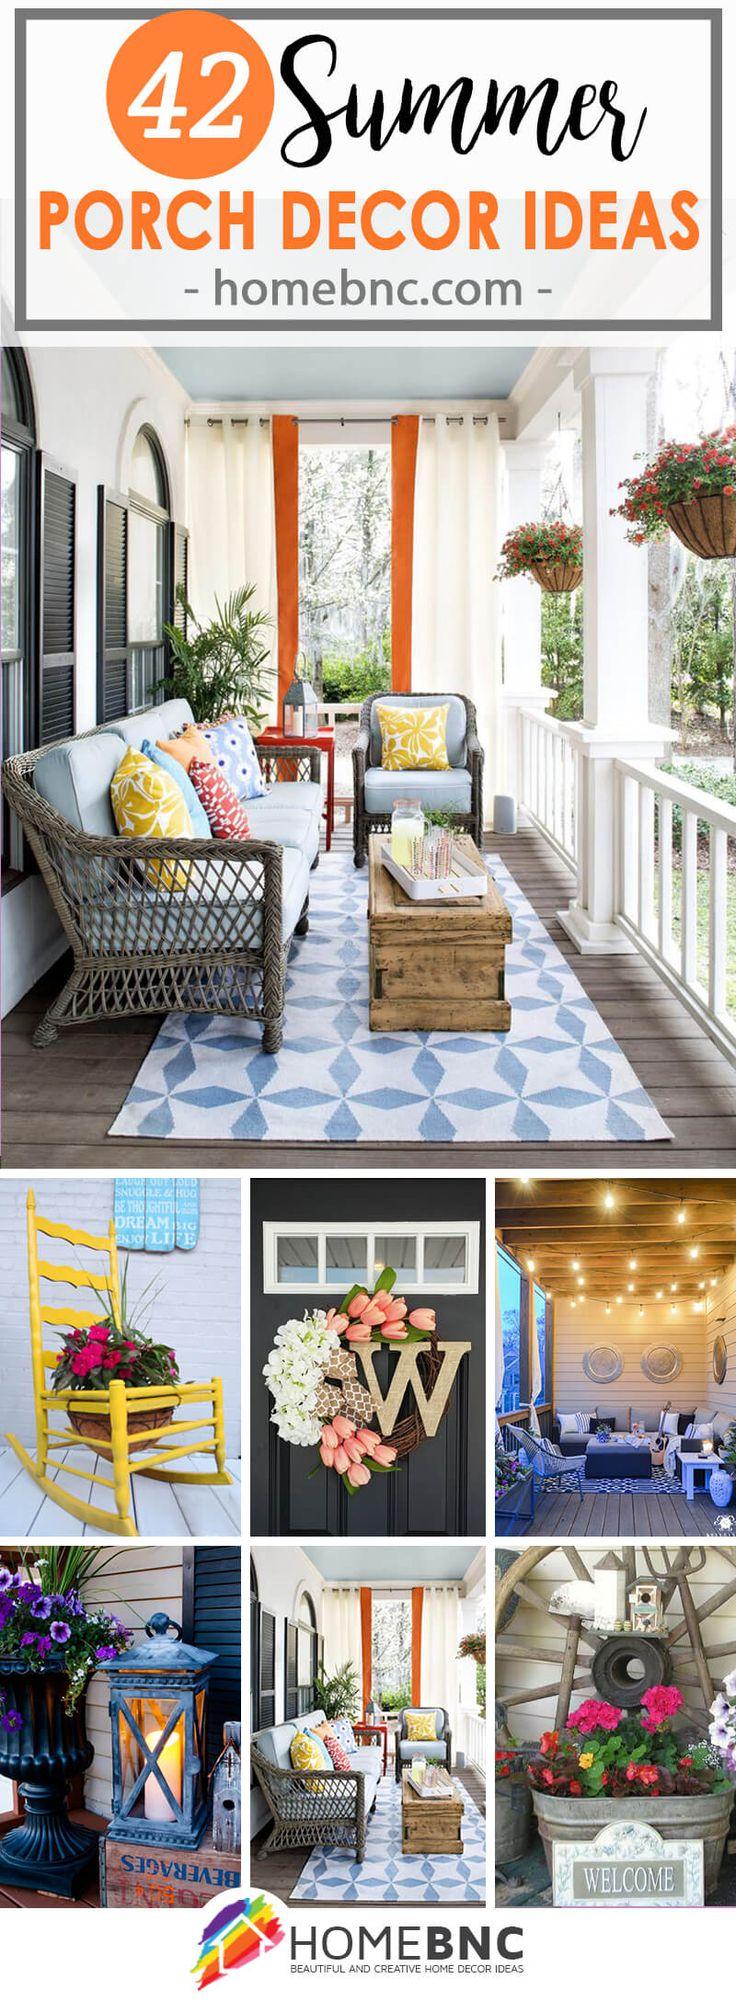 Summer Porch Decorations